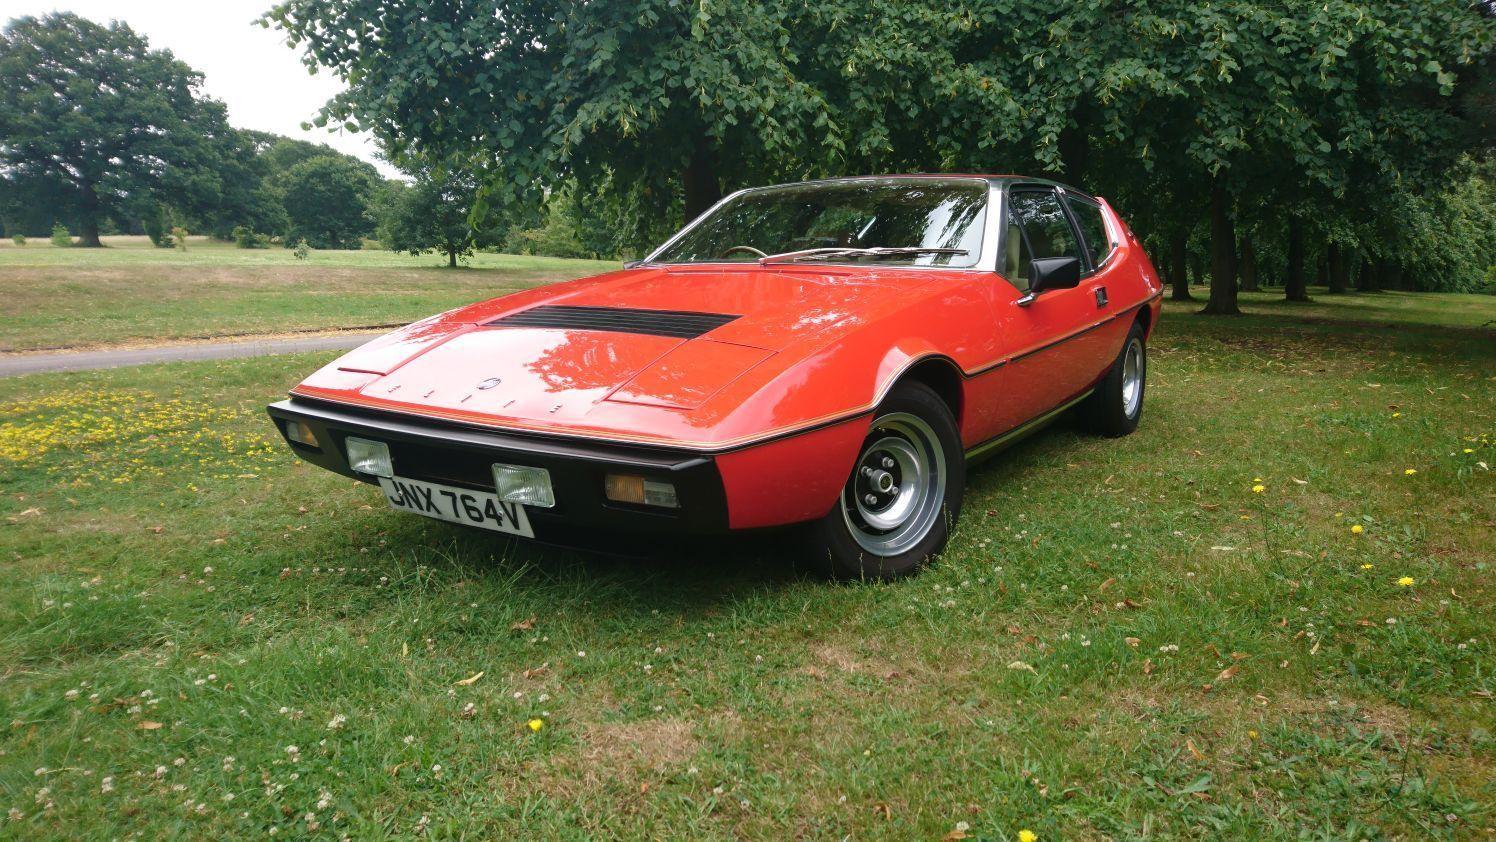 eBay: Genuine low mileage unrestored 1979 Lotus Elite 501 series ...